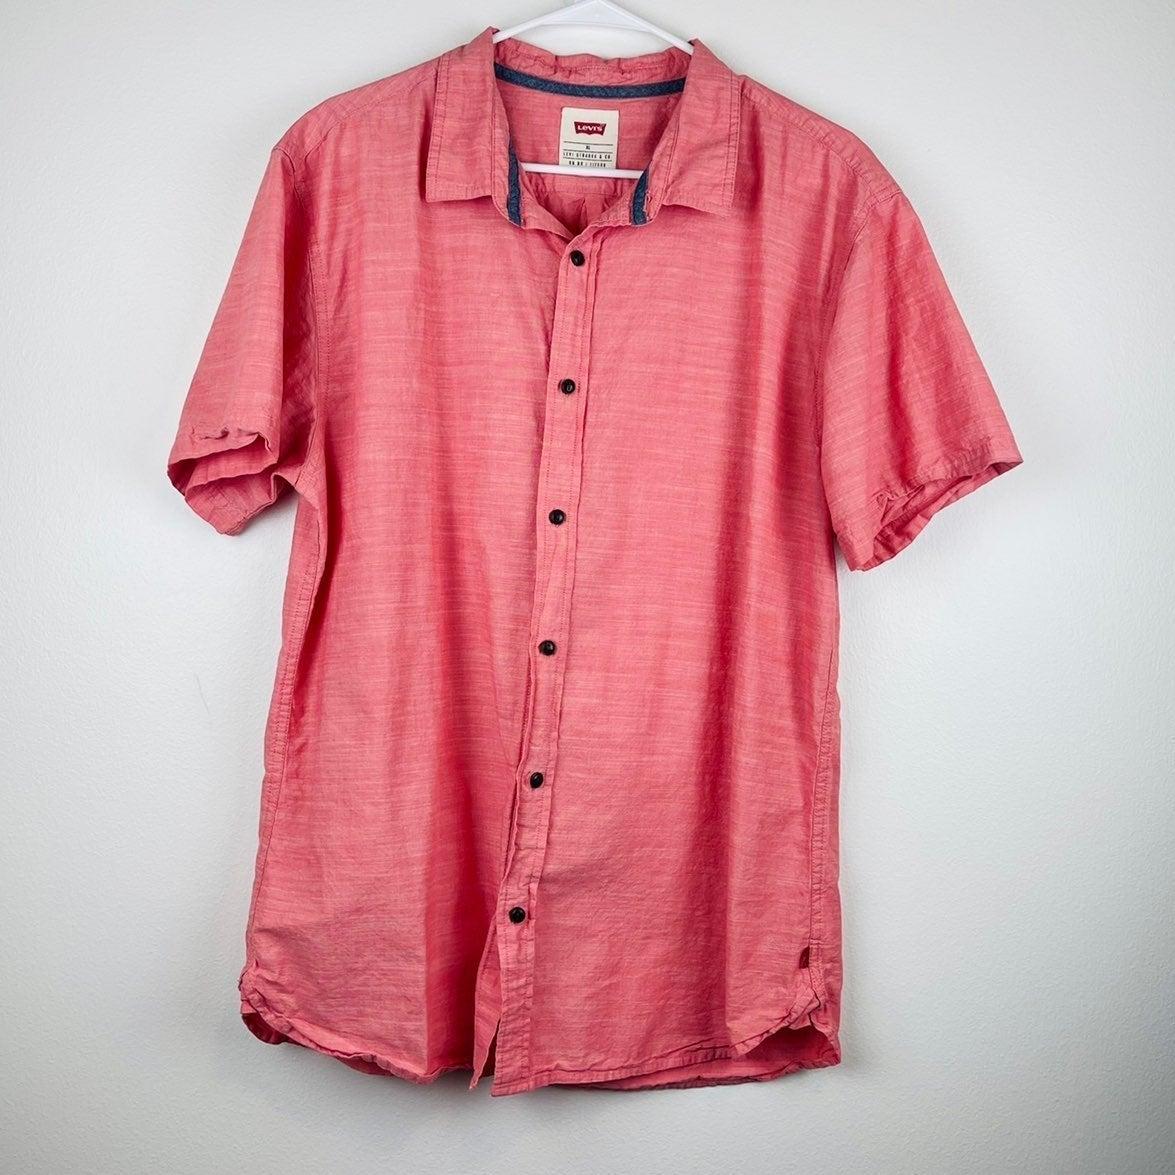 Levi Strauss Co Button Down Shirt XL